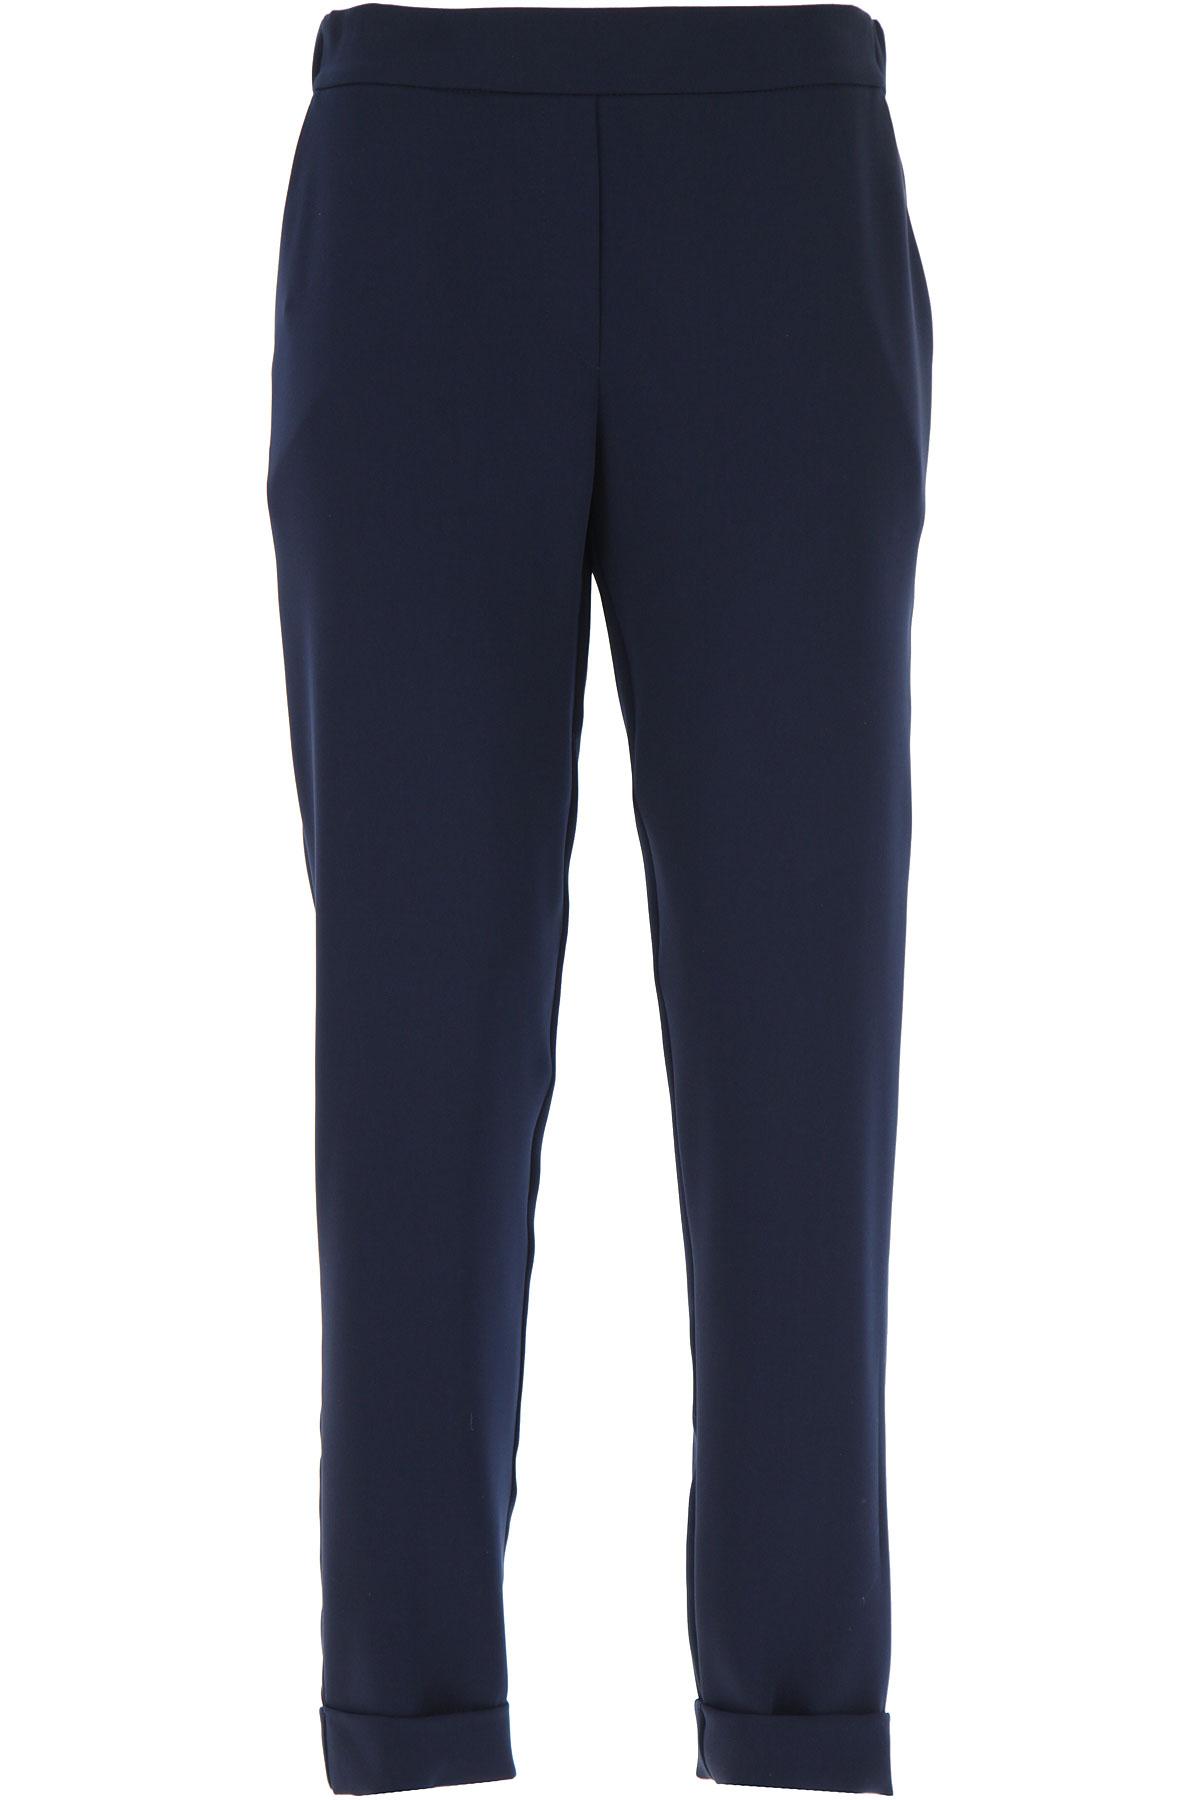 P.A.R.O.S.H. Pants for Women On Sale, Blu Navy, polyester, 2019, 4 6 8